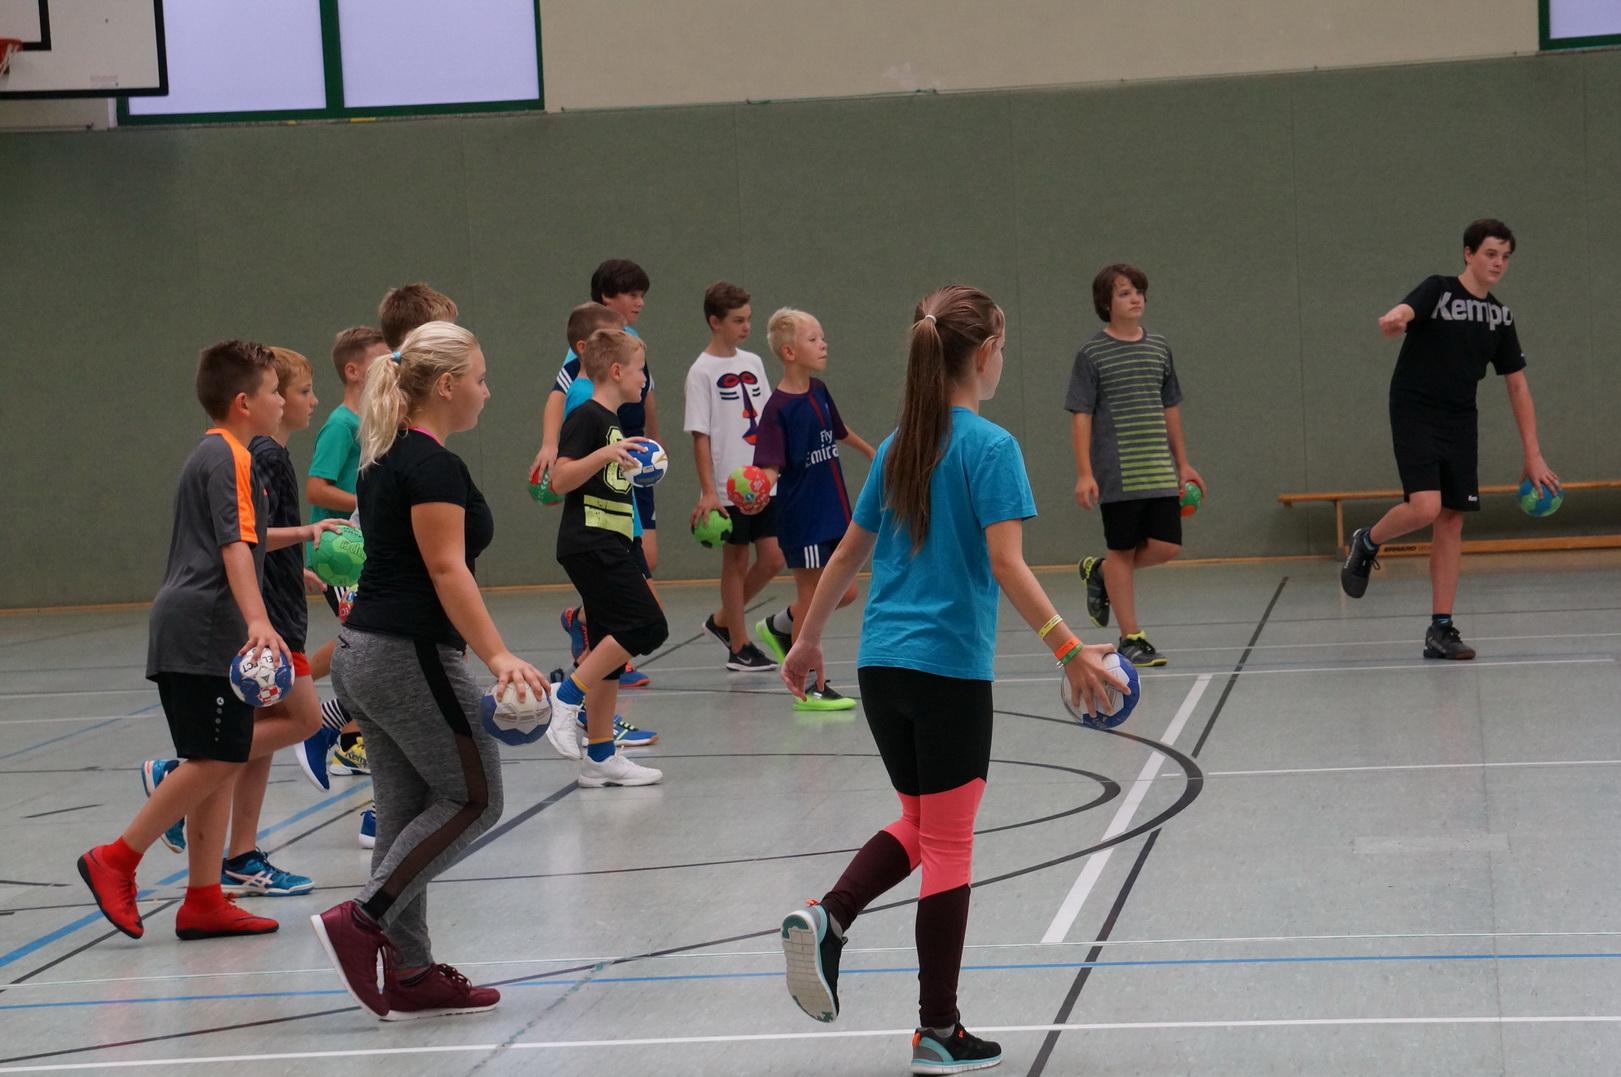 201808_Handballcamp_SDH_MG_055w